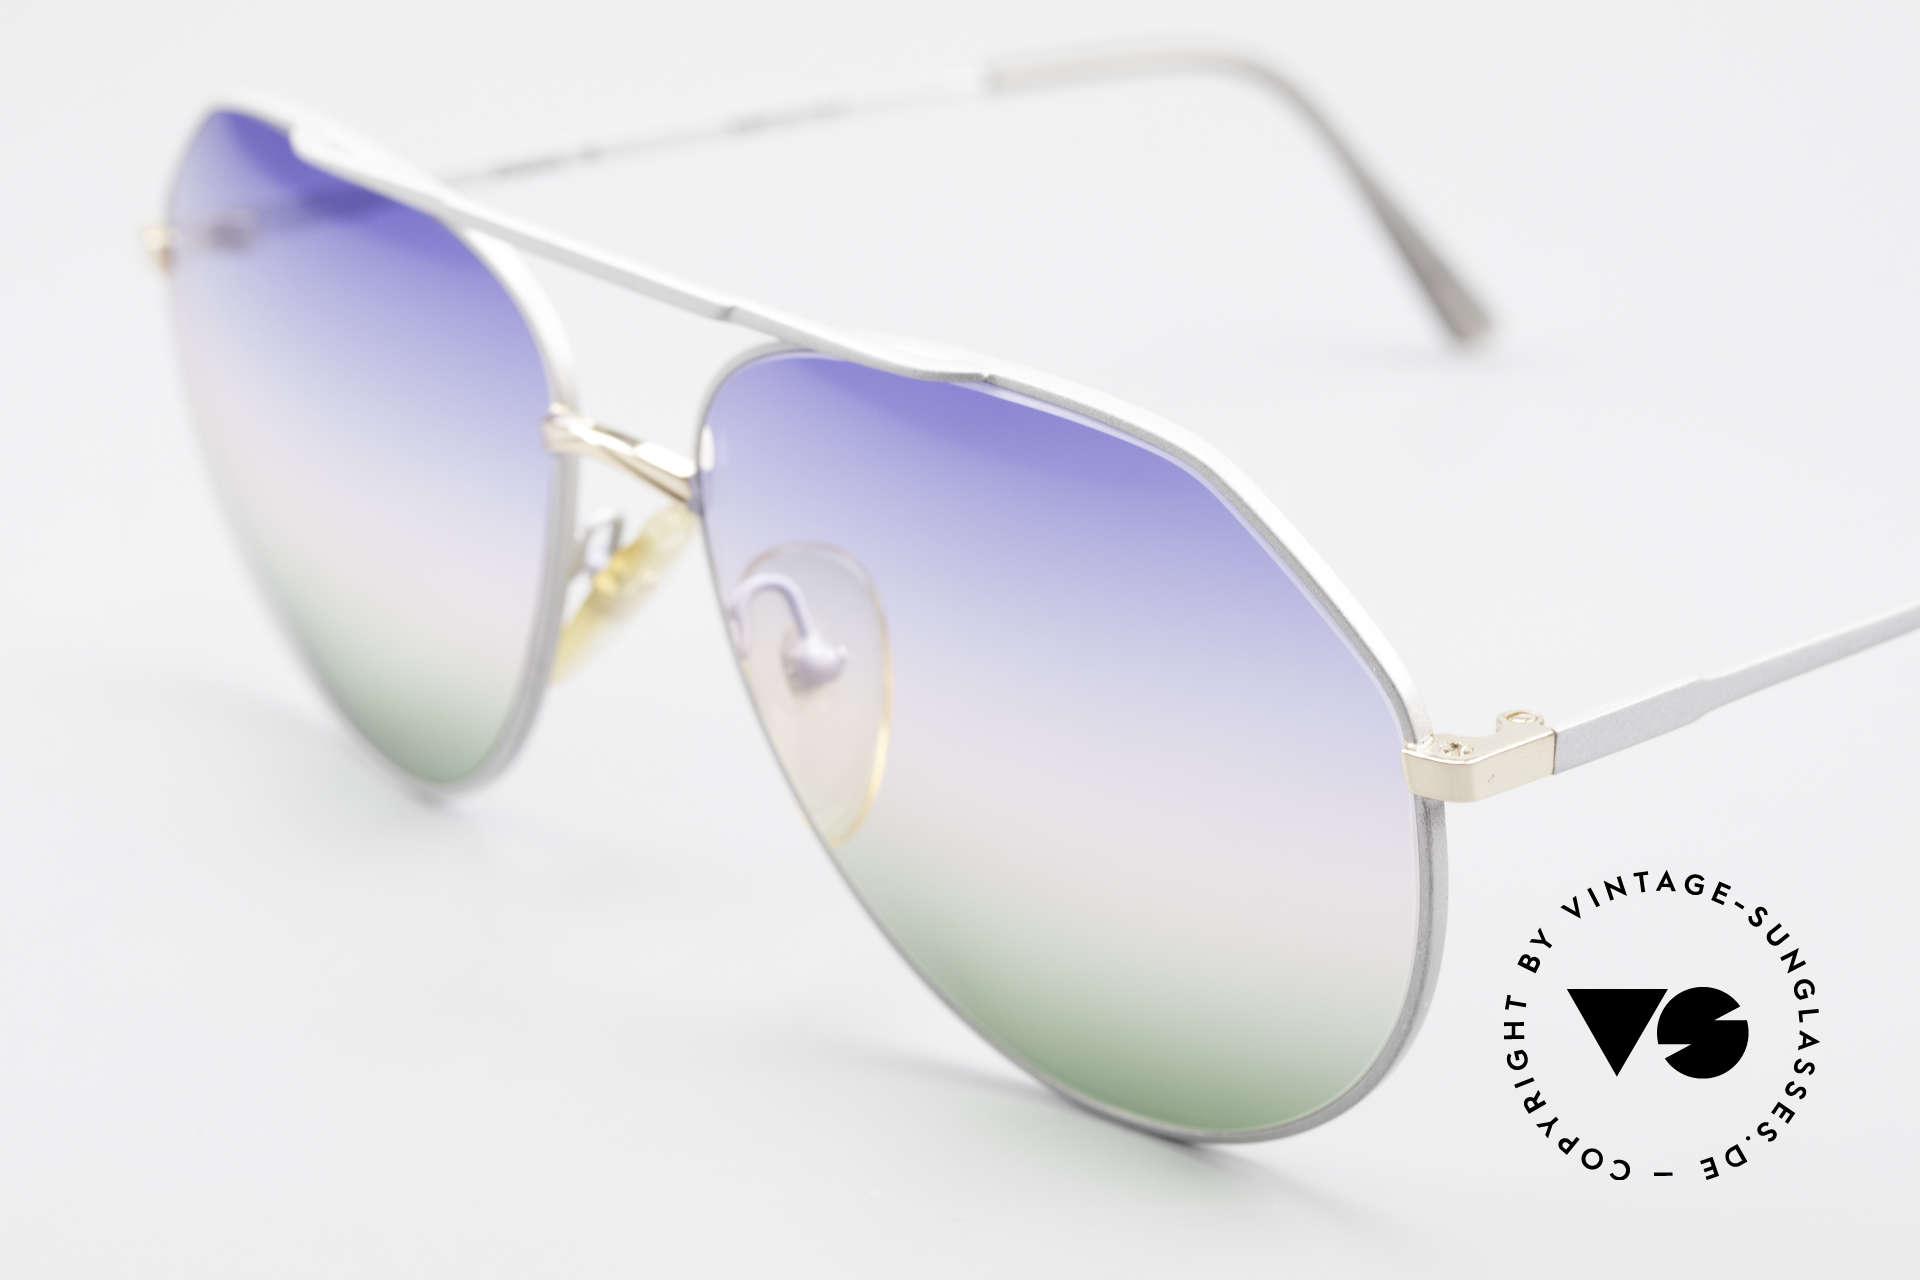 Casanova 6052 Titanium Aviator Sunglasses, great combination of colors, shape & functionality, Made for Men and Women